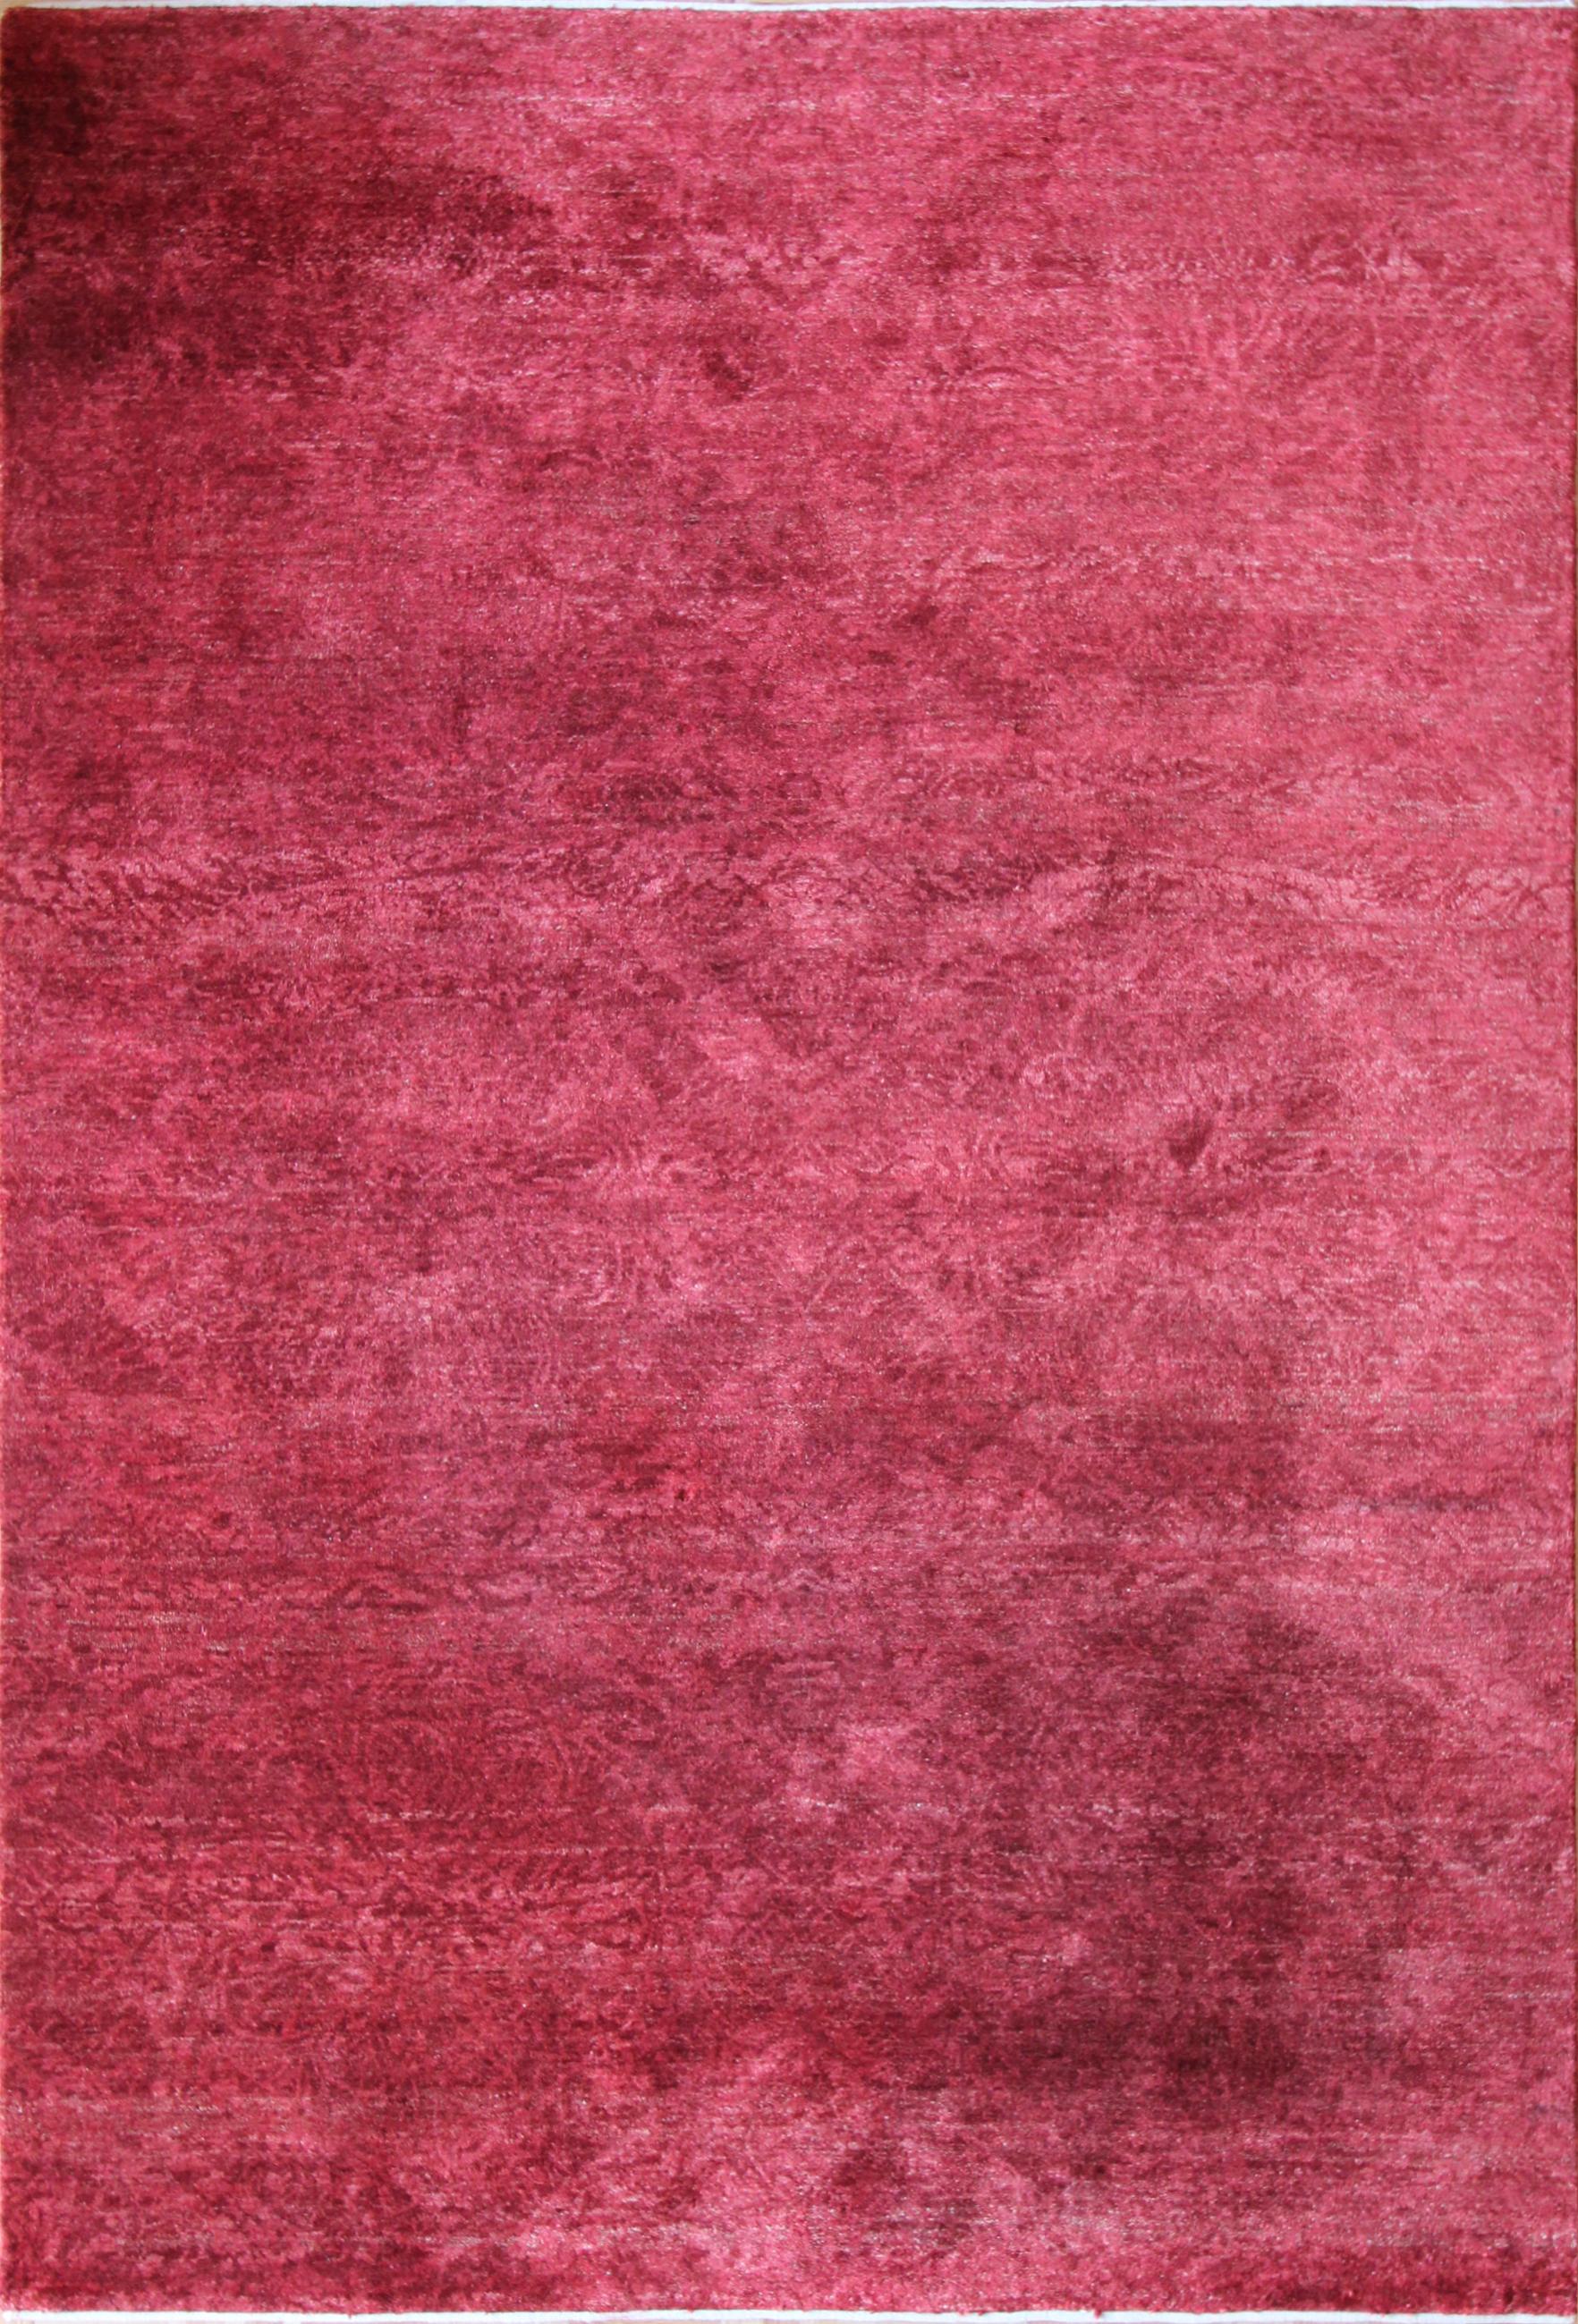 778 Kundan Silk, Jaipur, 5'11''x8'8'' copy